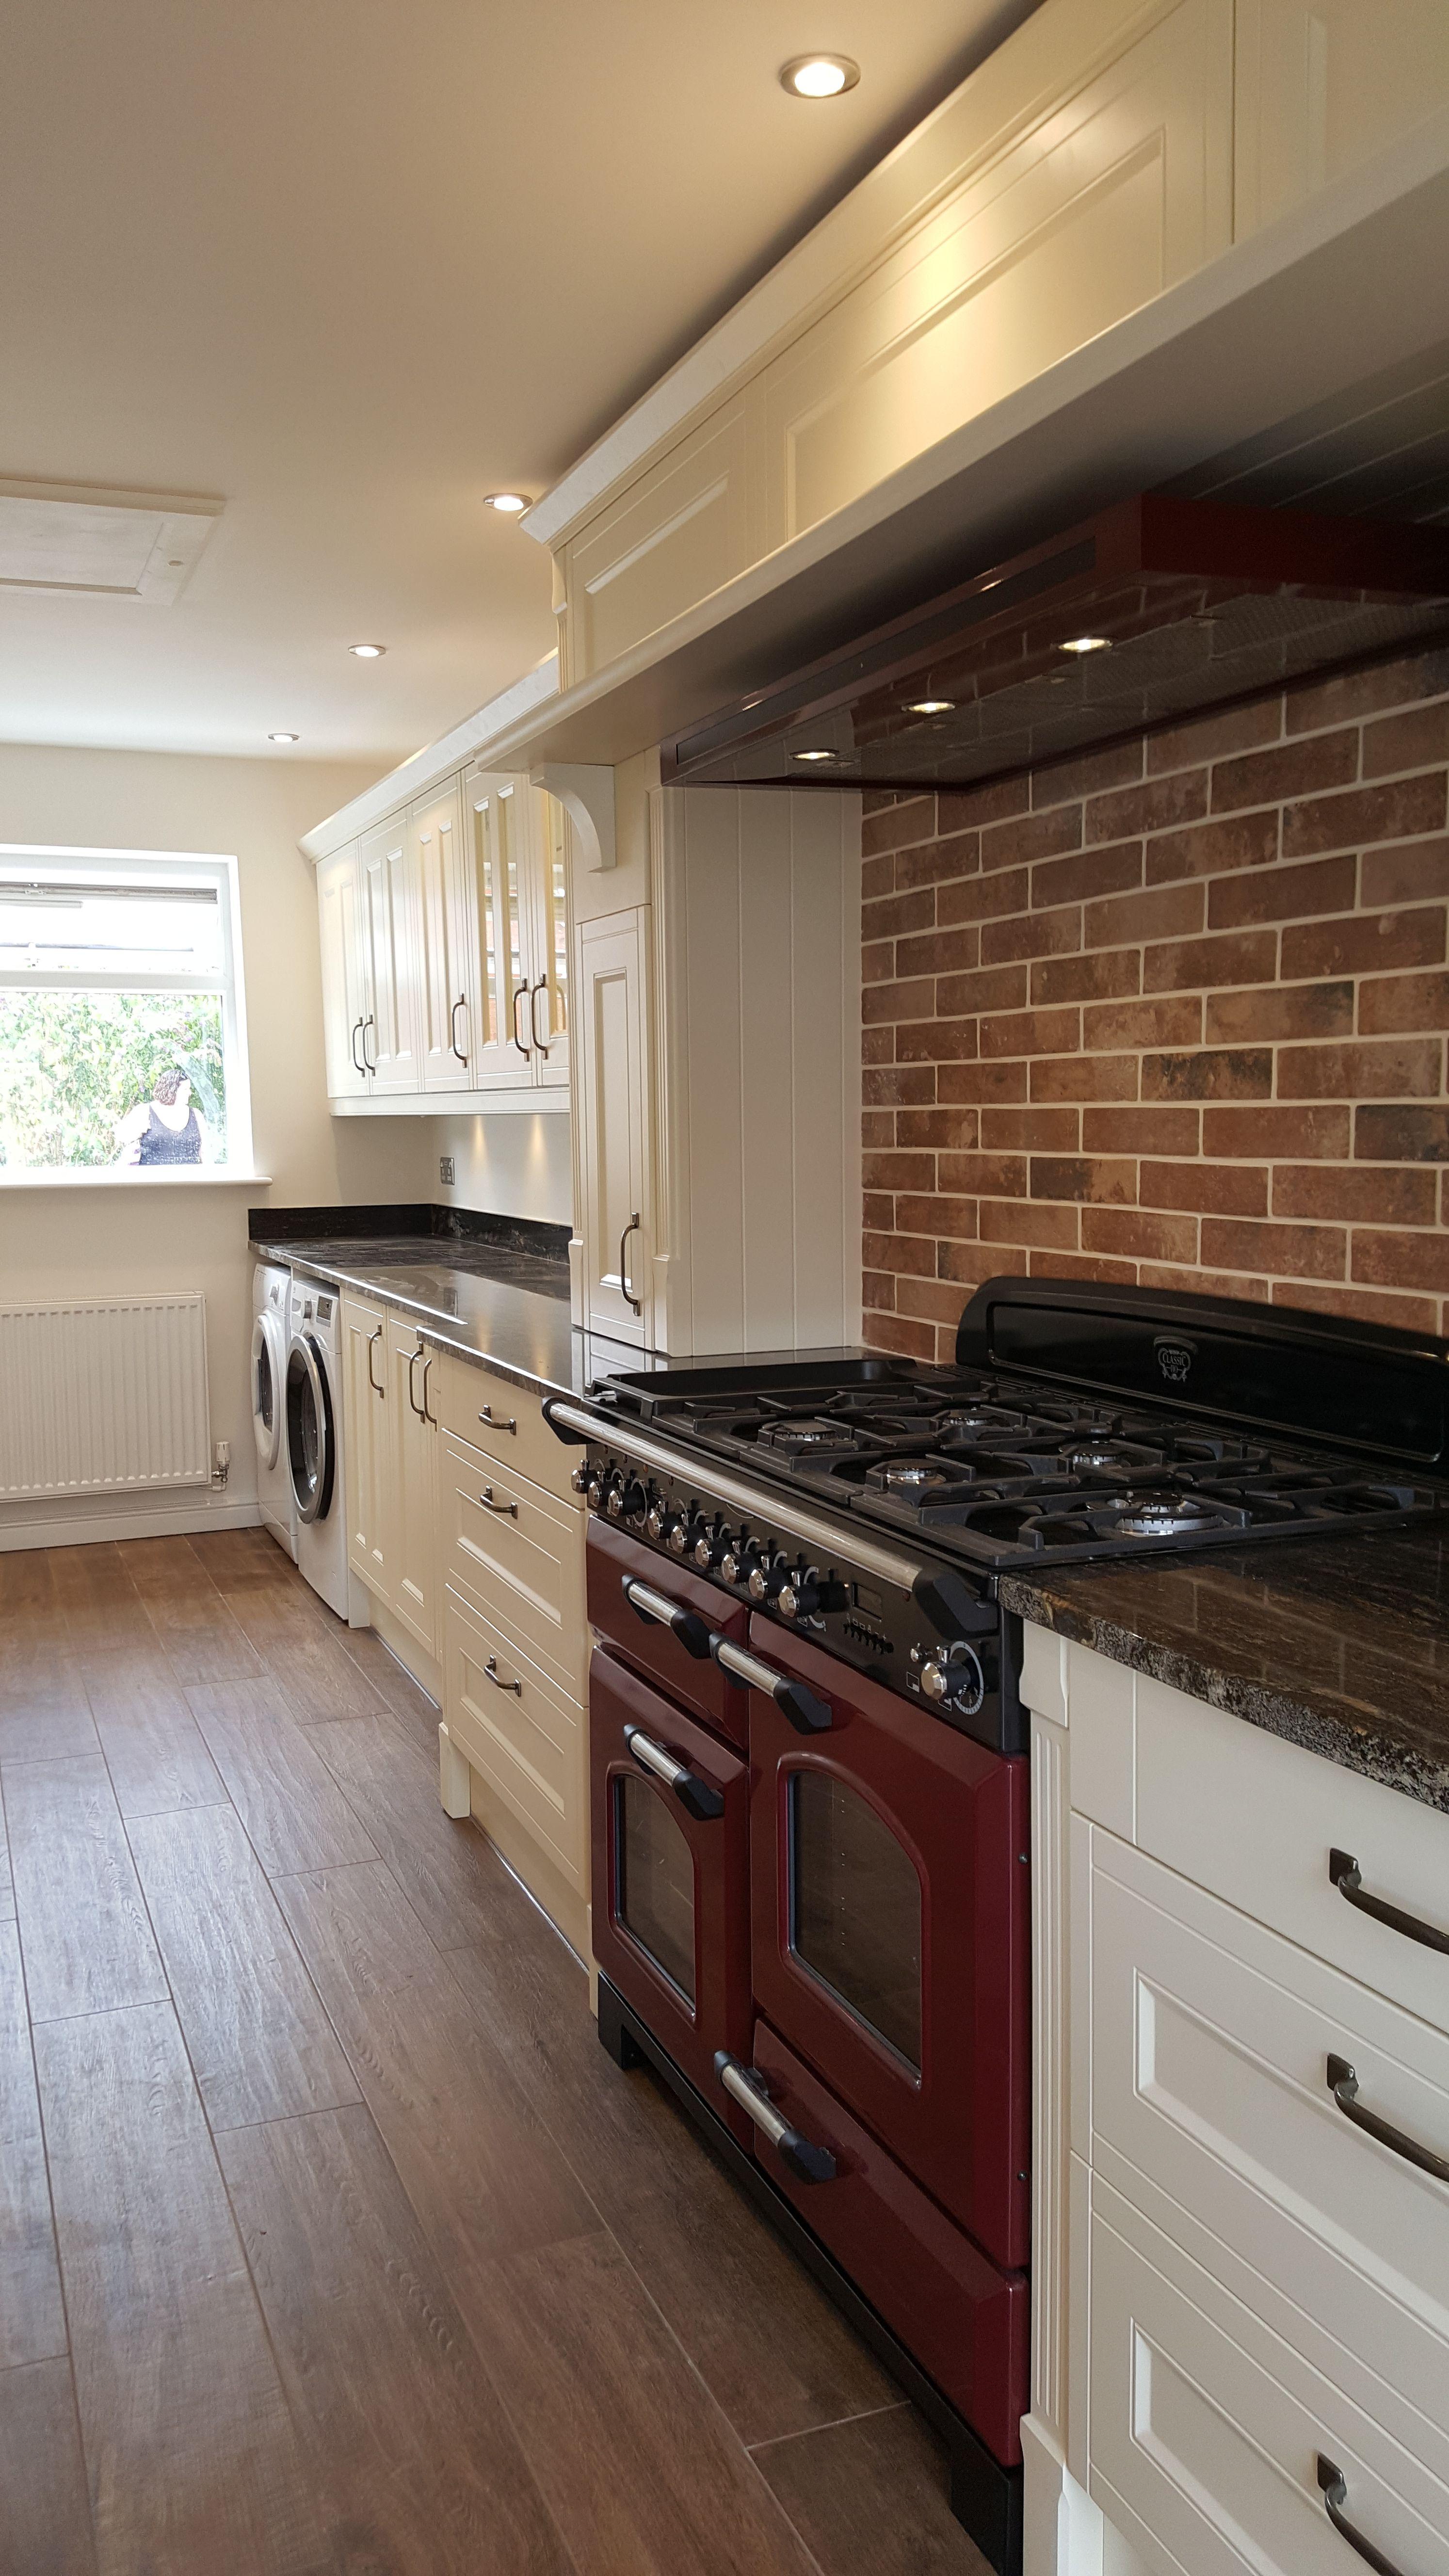 Wren Kitchen Cranberry Range Cooker Brick Tiled Splash Back Overmantle Cupboards Wren Kitchen Range Cooker Kitchen